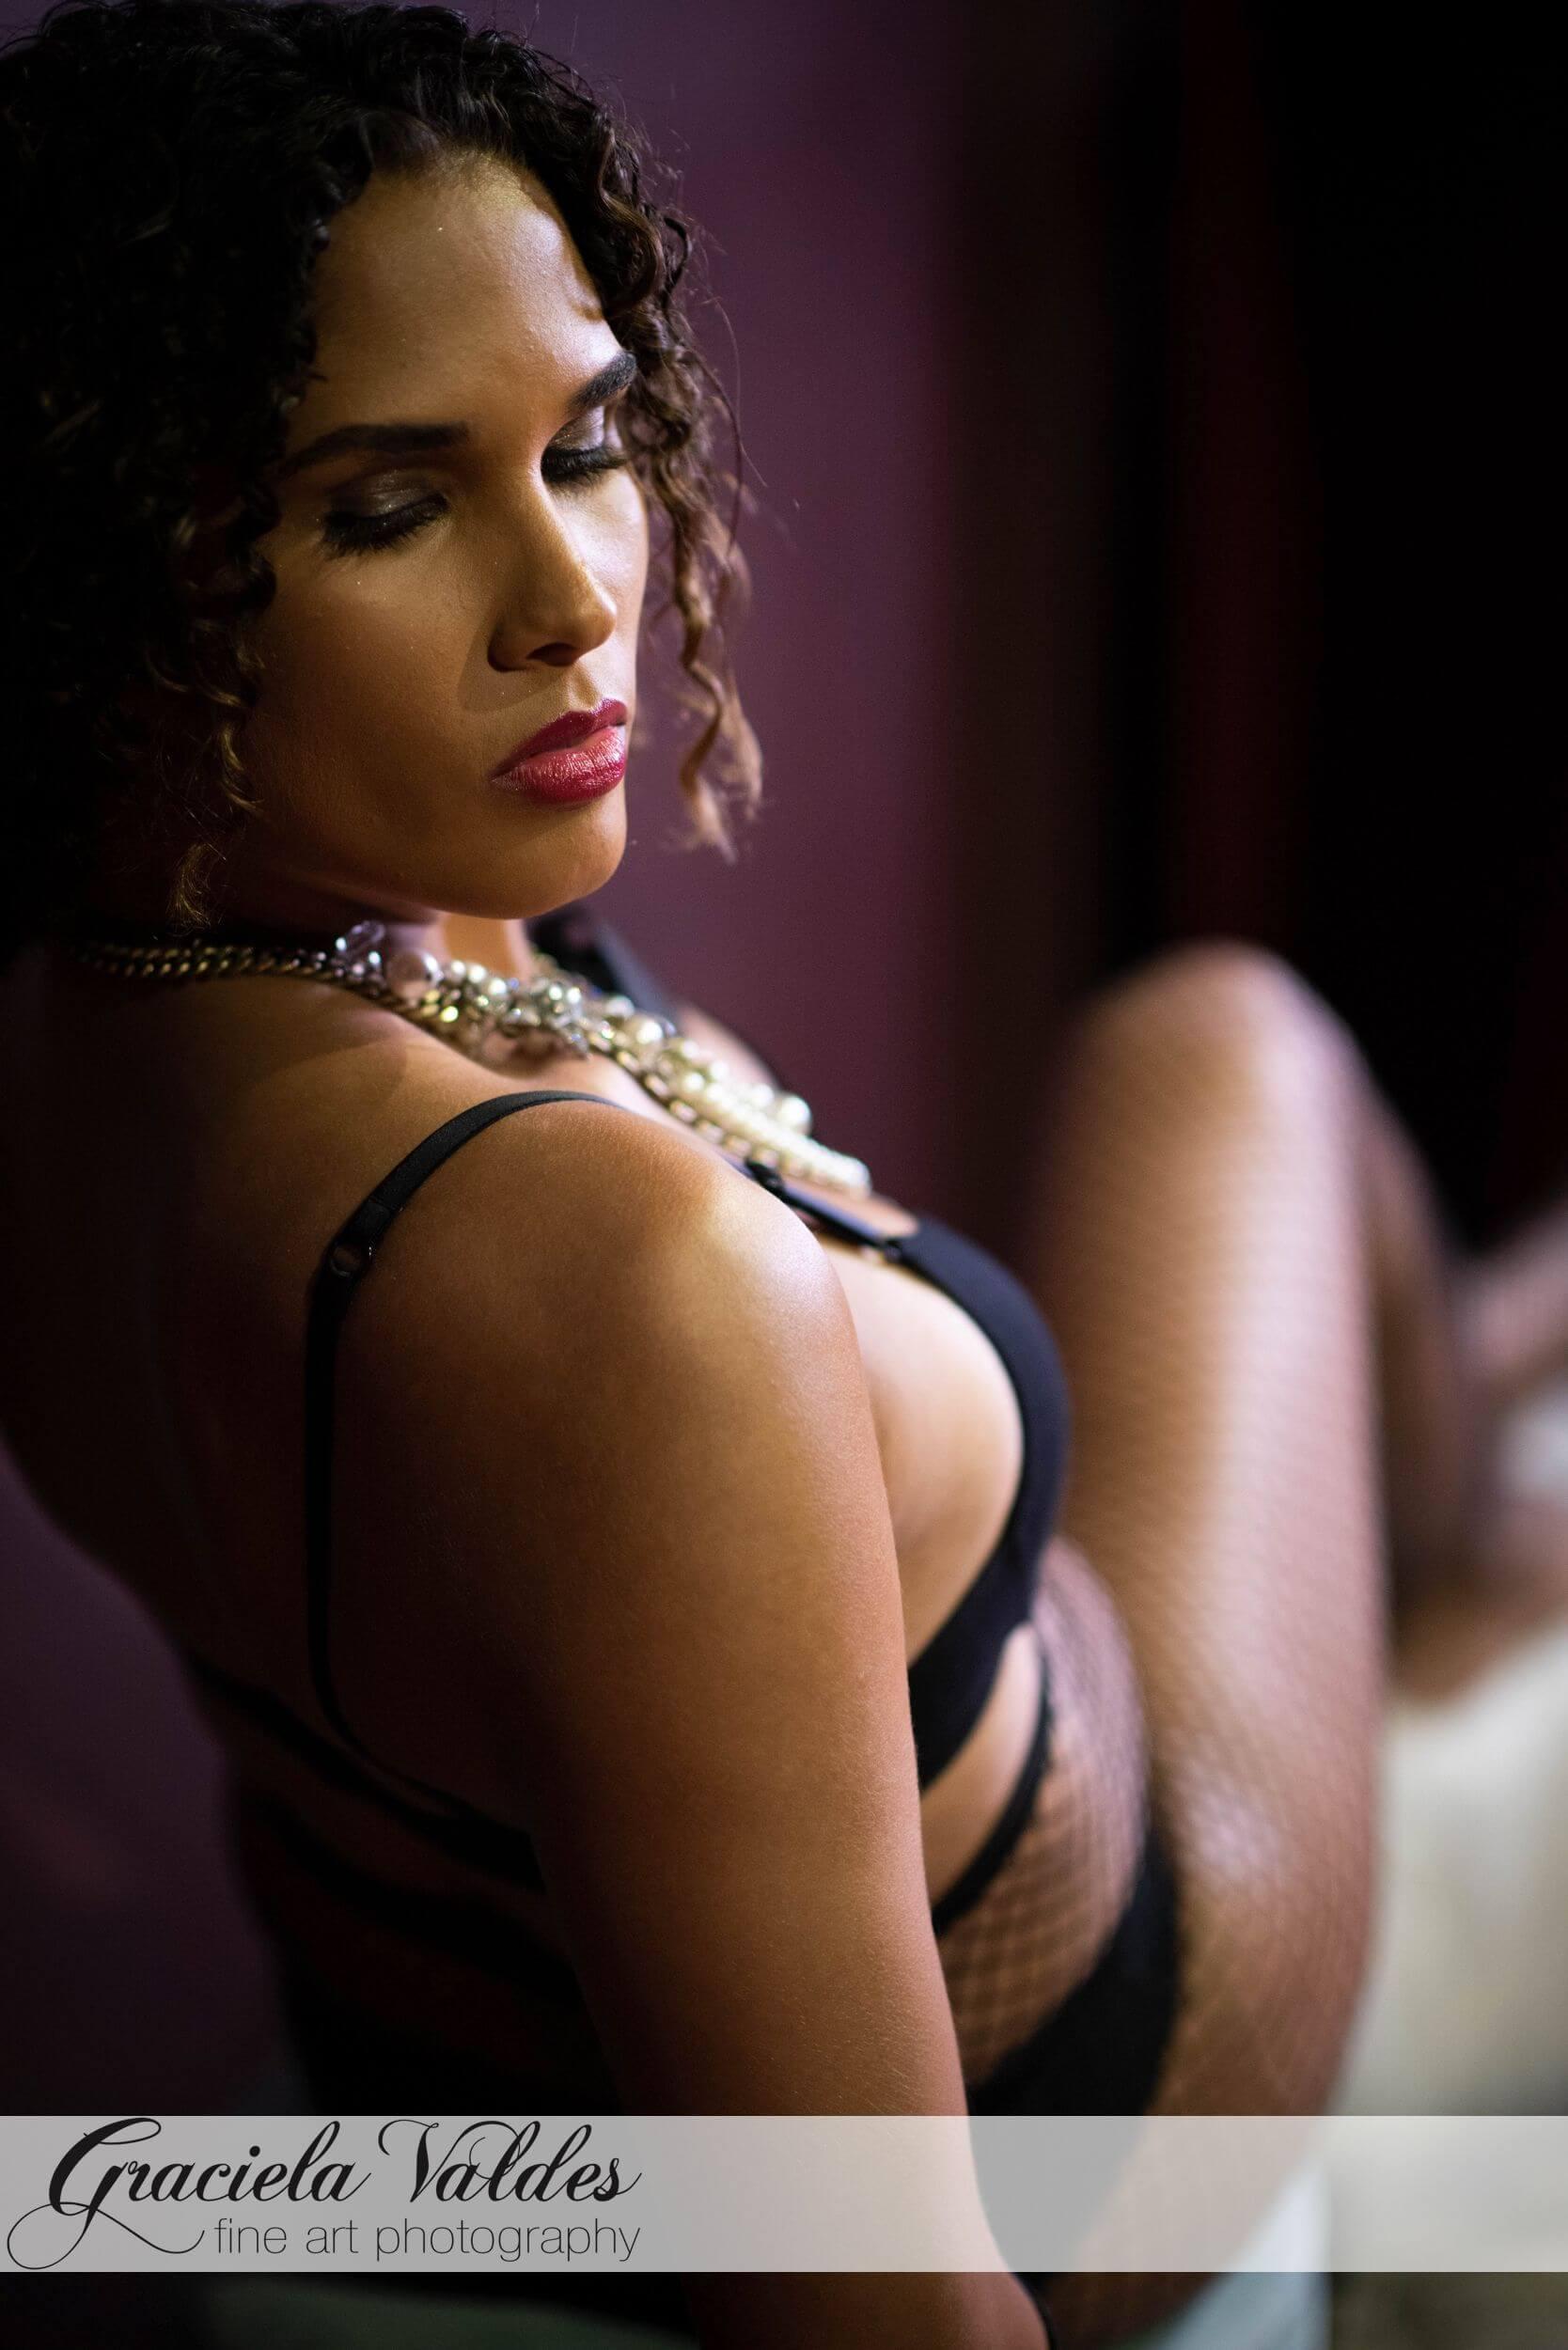 Sex After Dark by Graciela Valdes 70.jpg